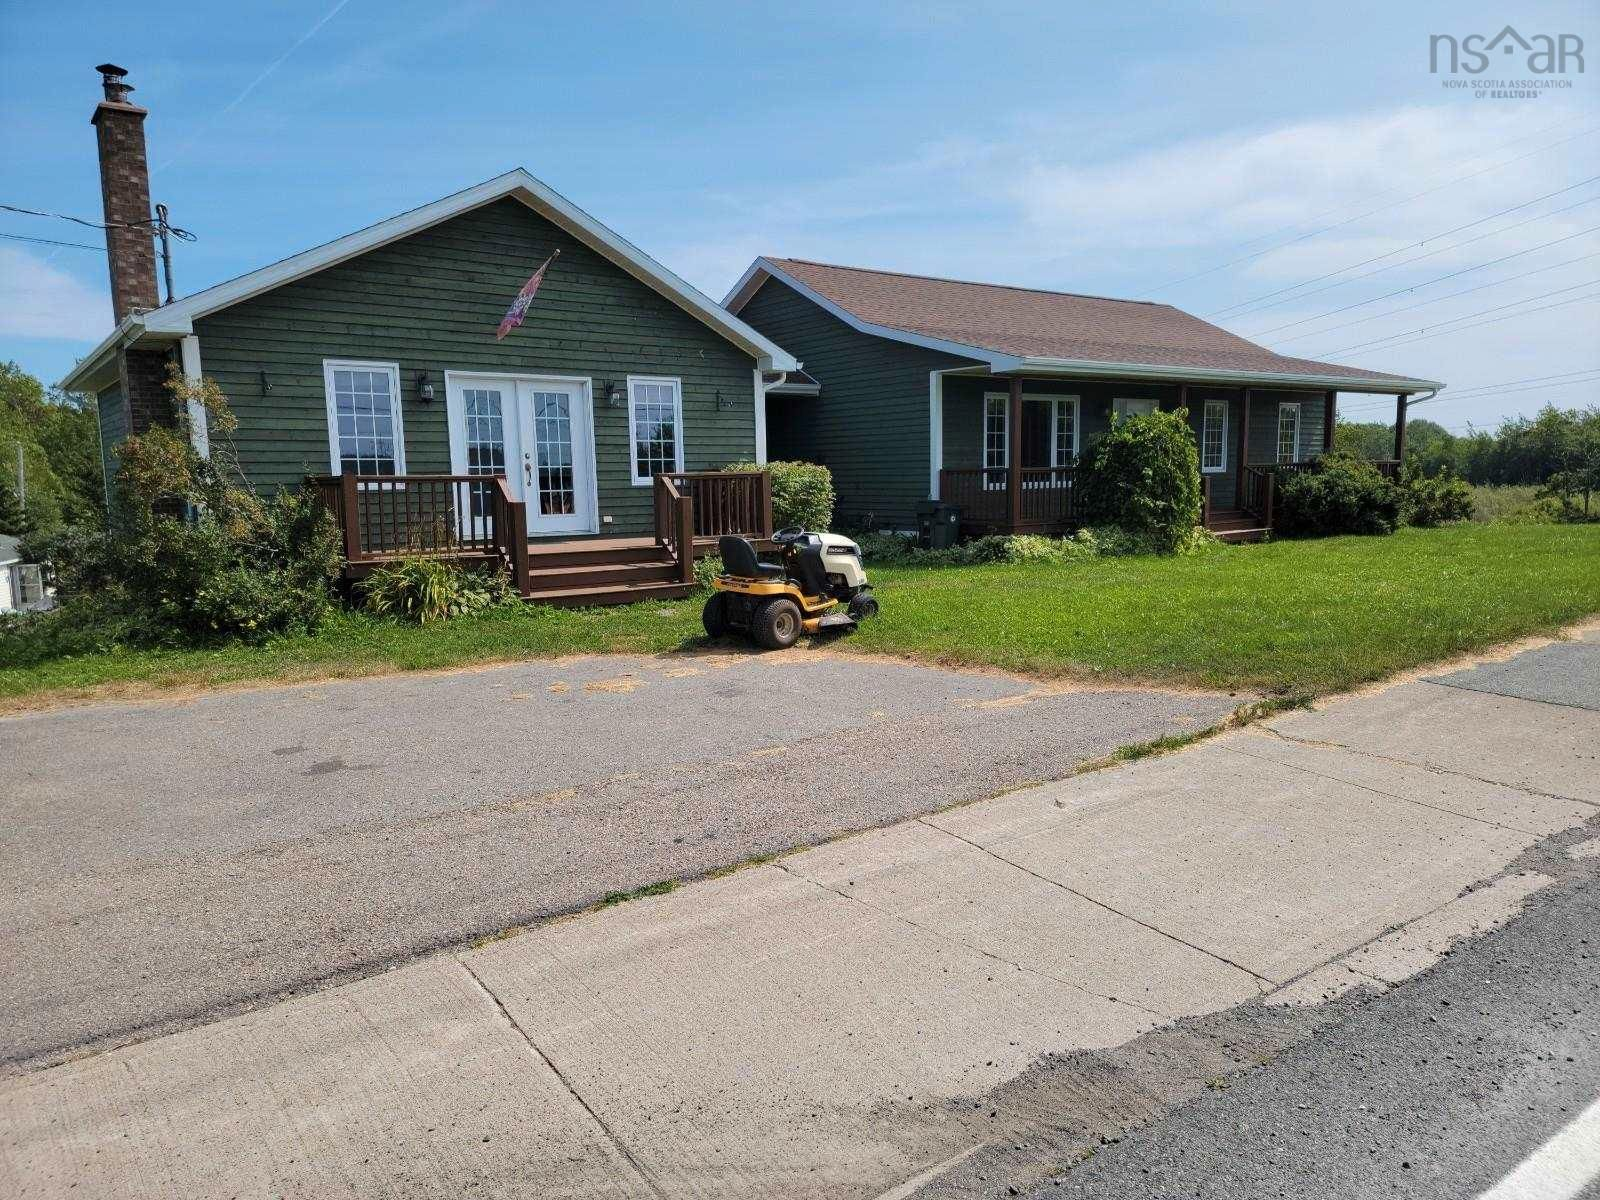 Main Photo: 156 Alder Point Road in Alder Point: 205-North Sydney Residential for sale (Cape Breton)  : MLS®# 202122057